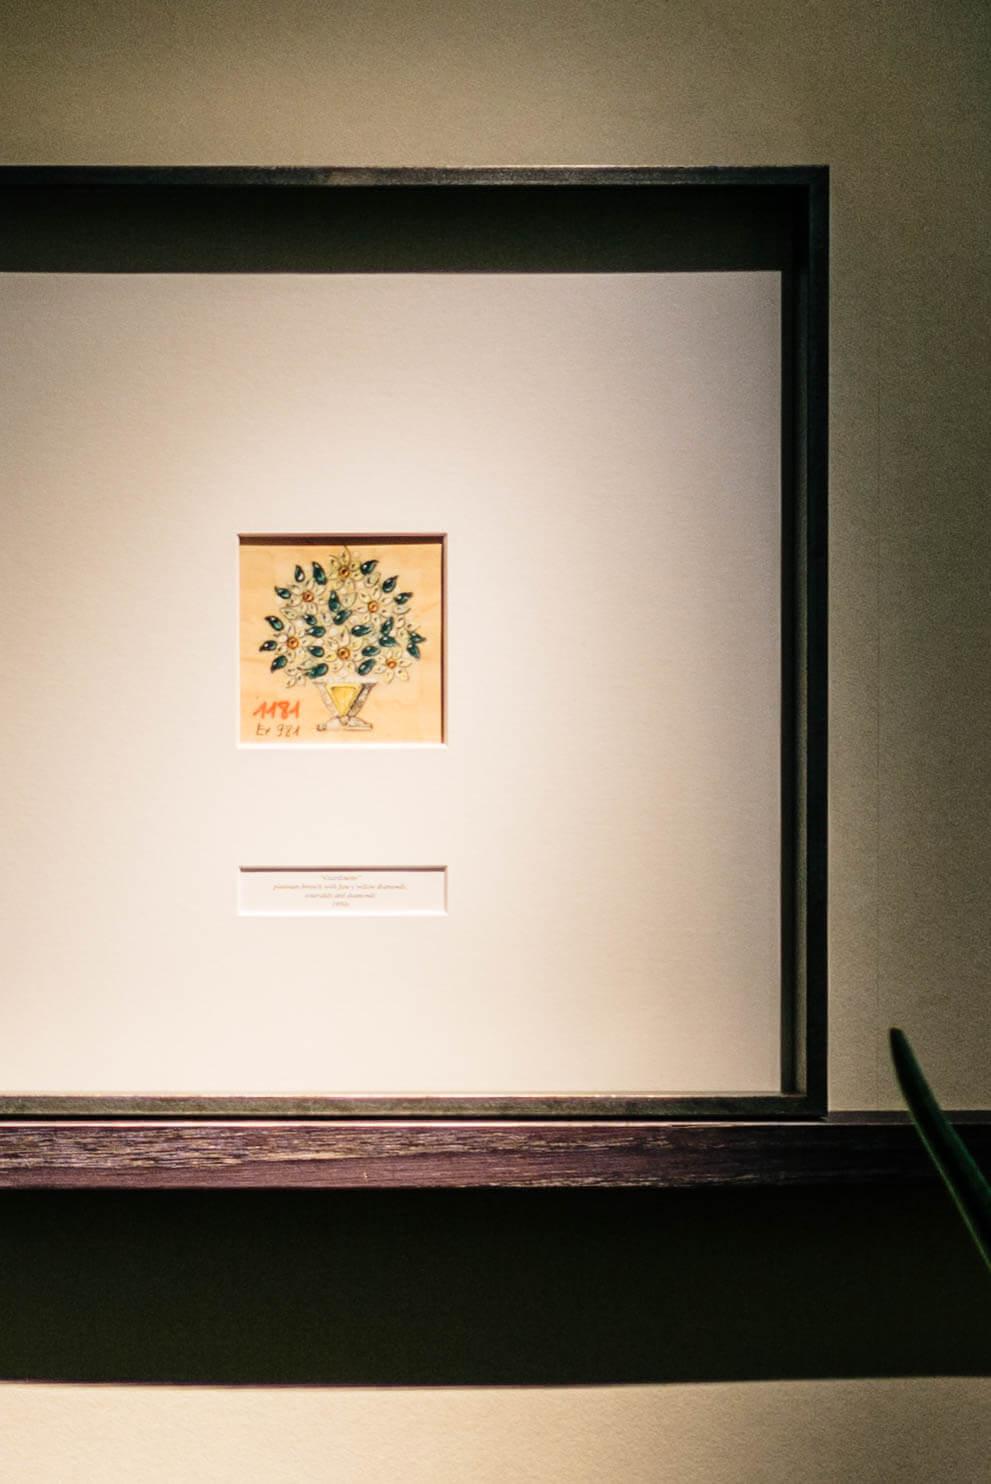 Hotel Bulgari Milano uses designs of broaches as artwork on the walls, The Taste Edit